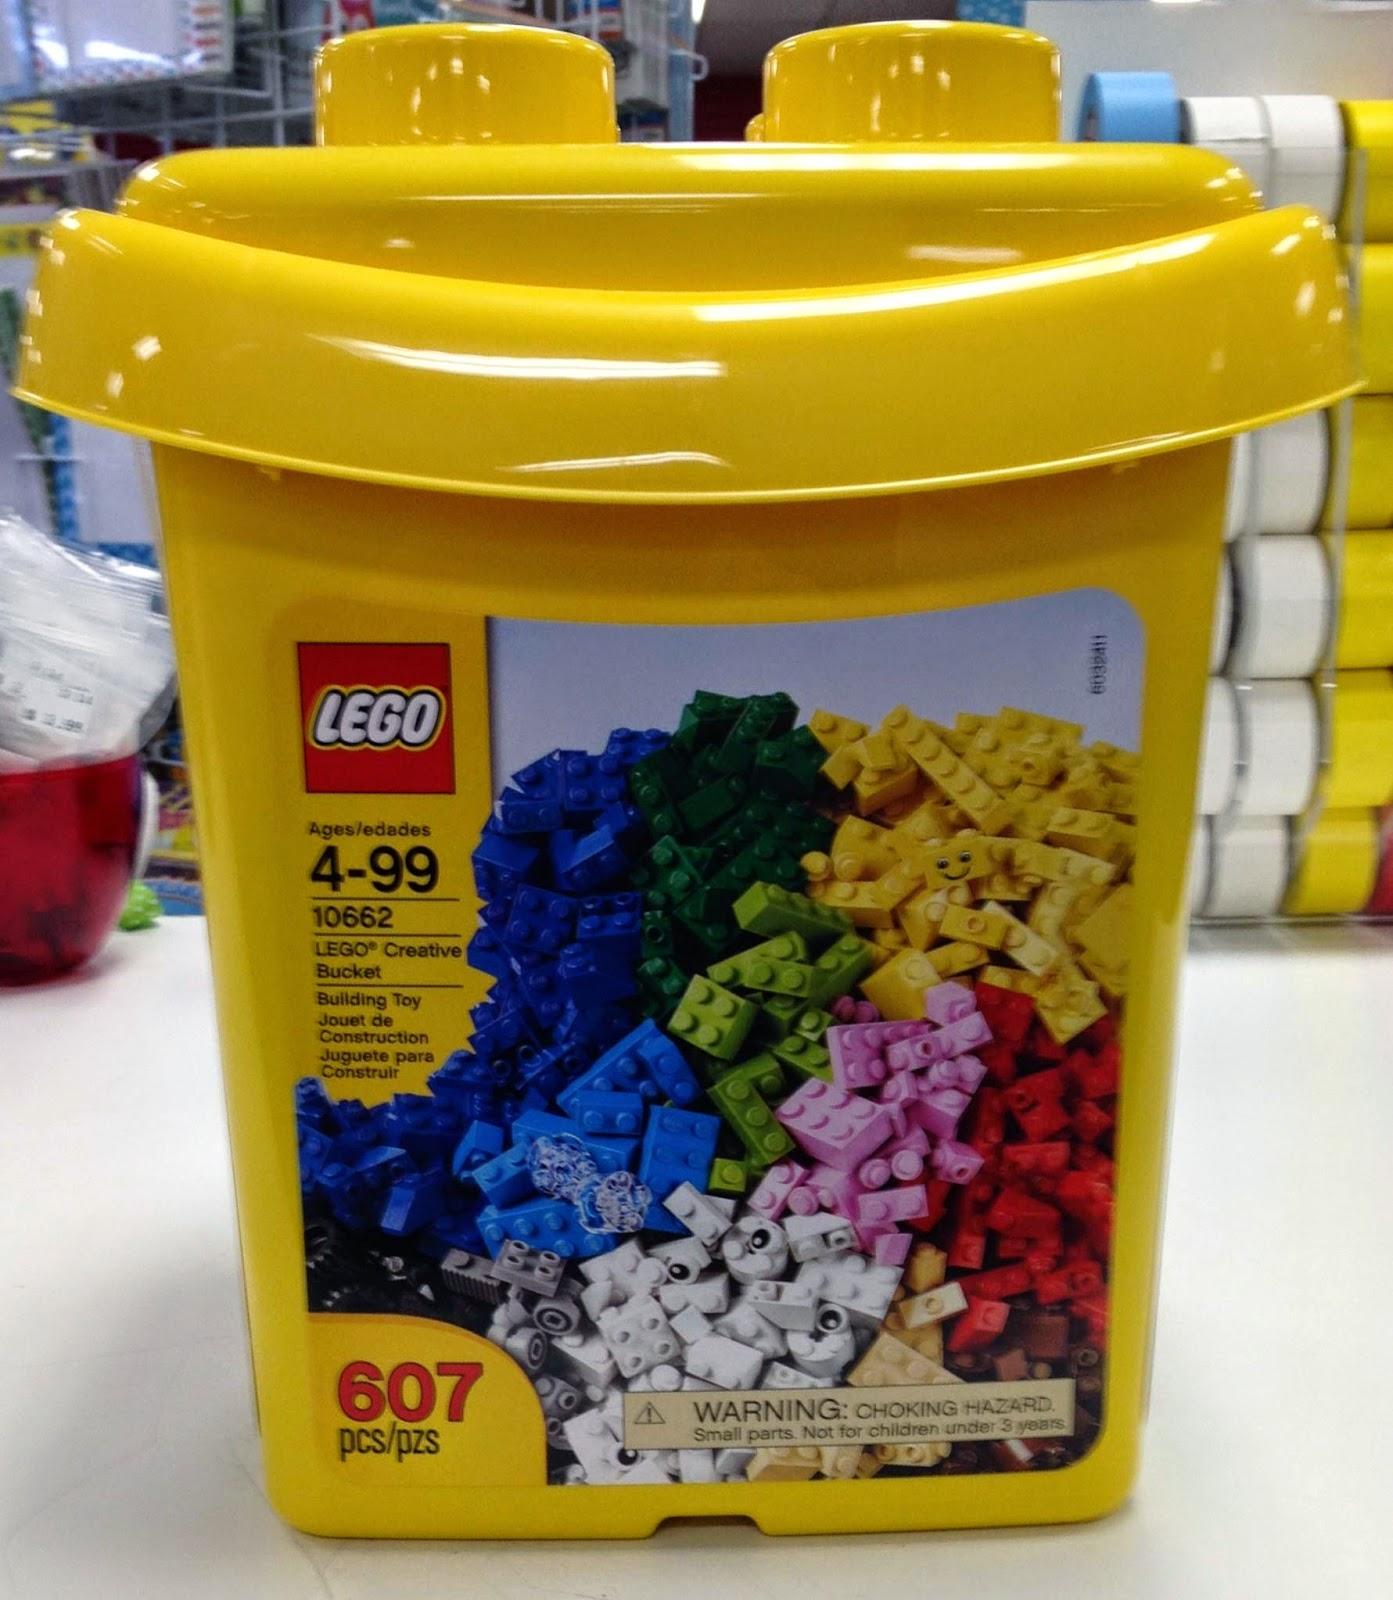 Lego Lắp Ráp Creative Bucket 10662